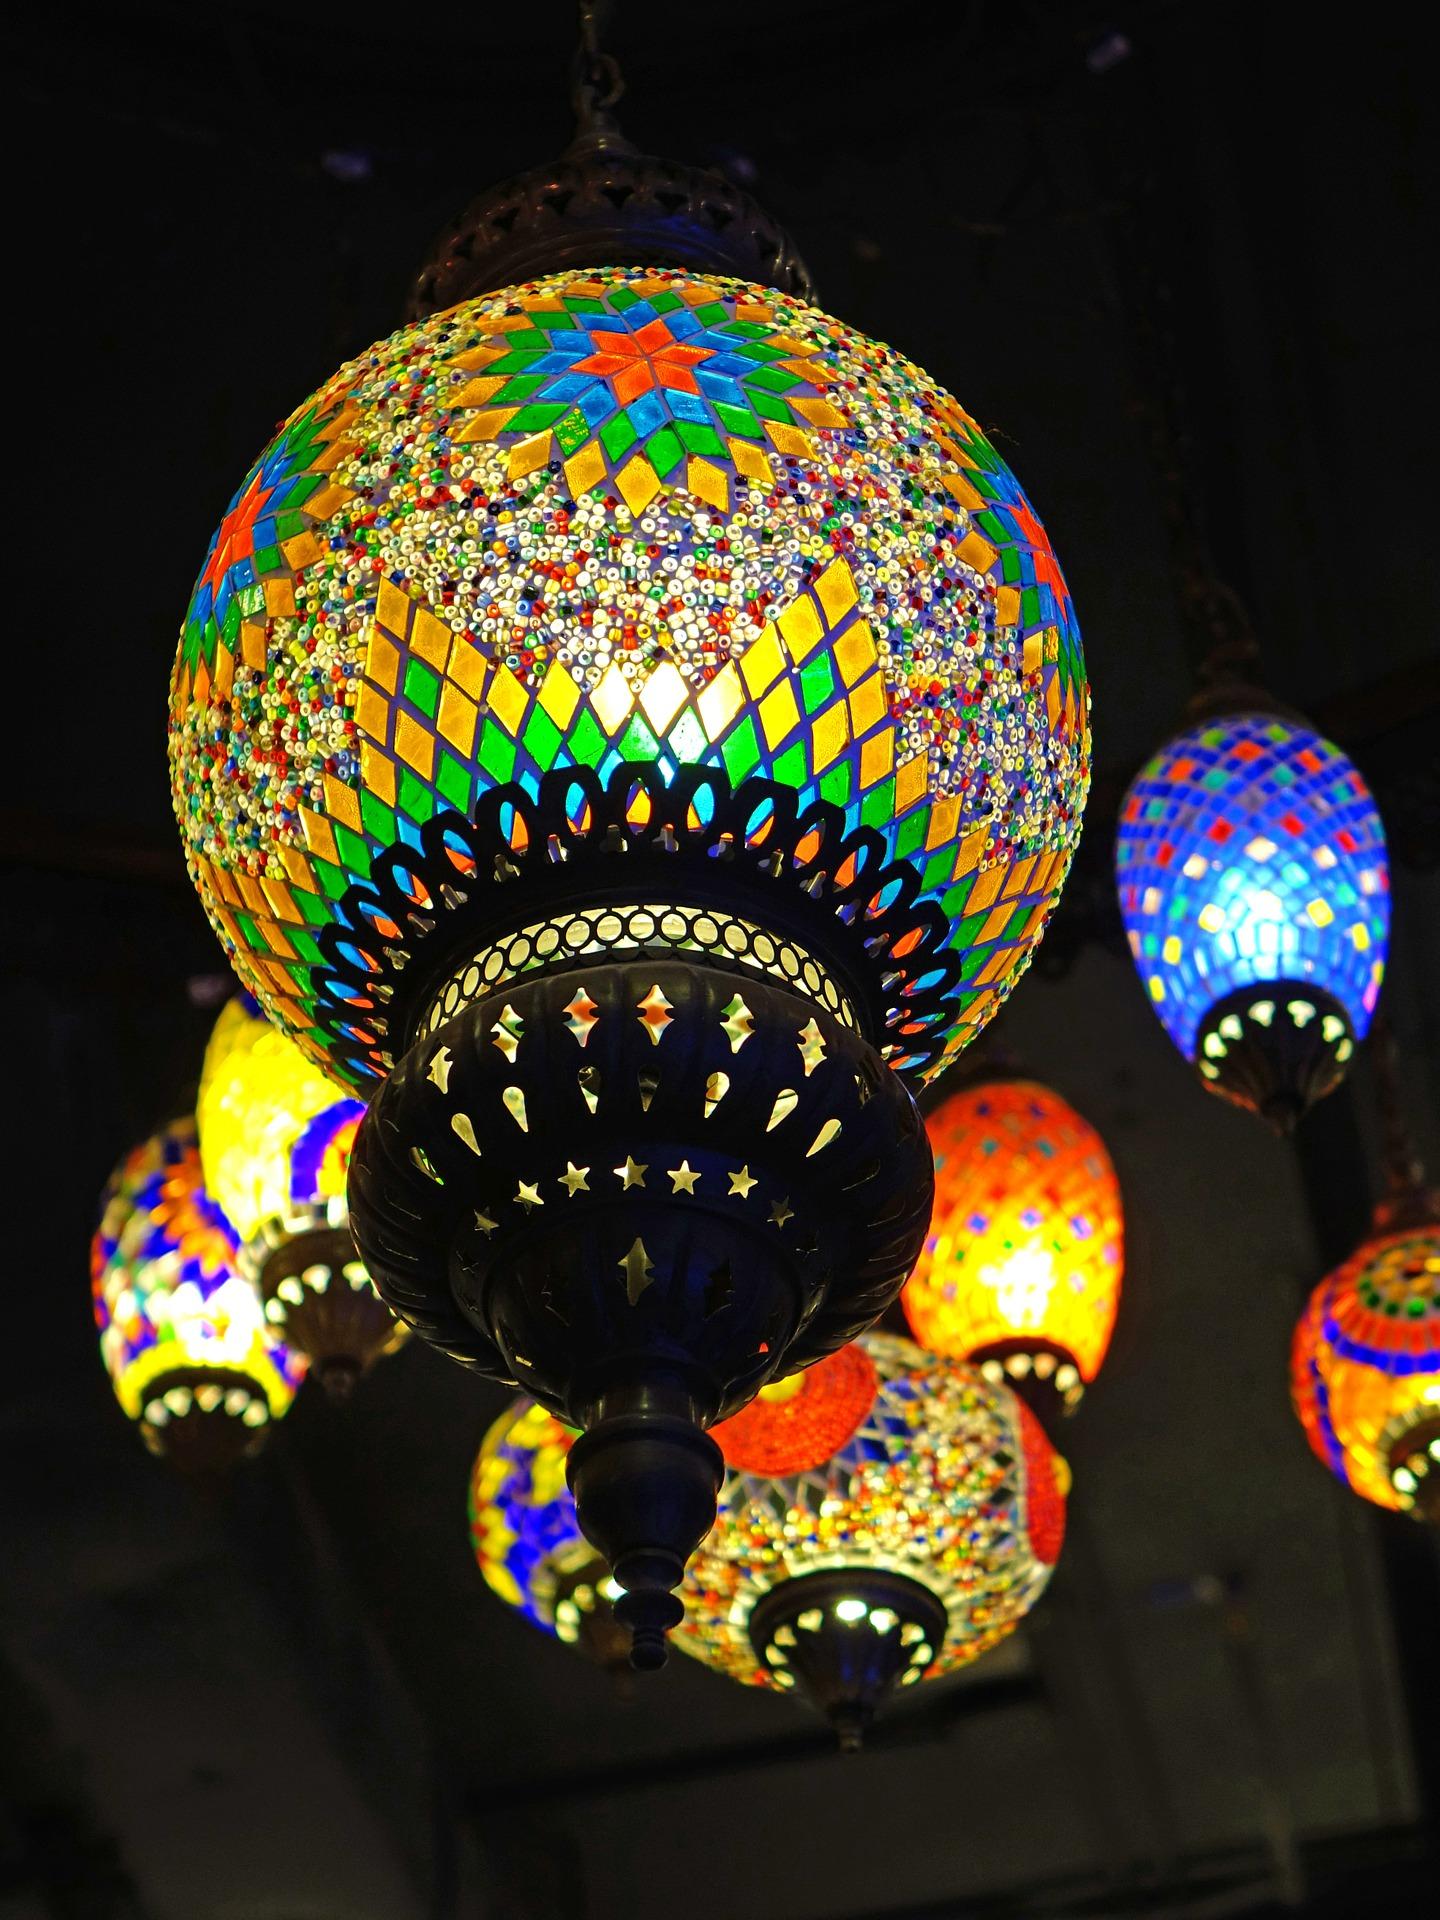 Modern Lanterns, Round, Modern, Light, Lamp, HQ Photo